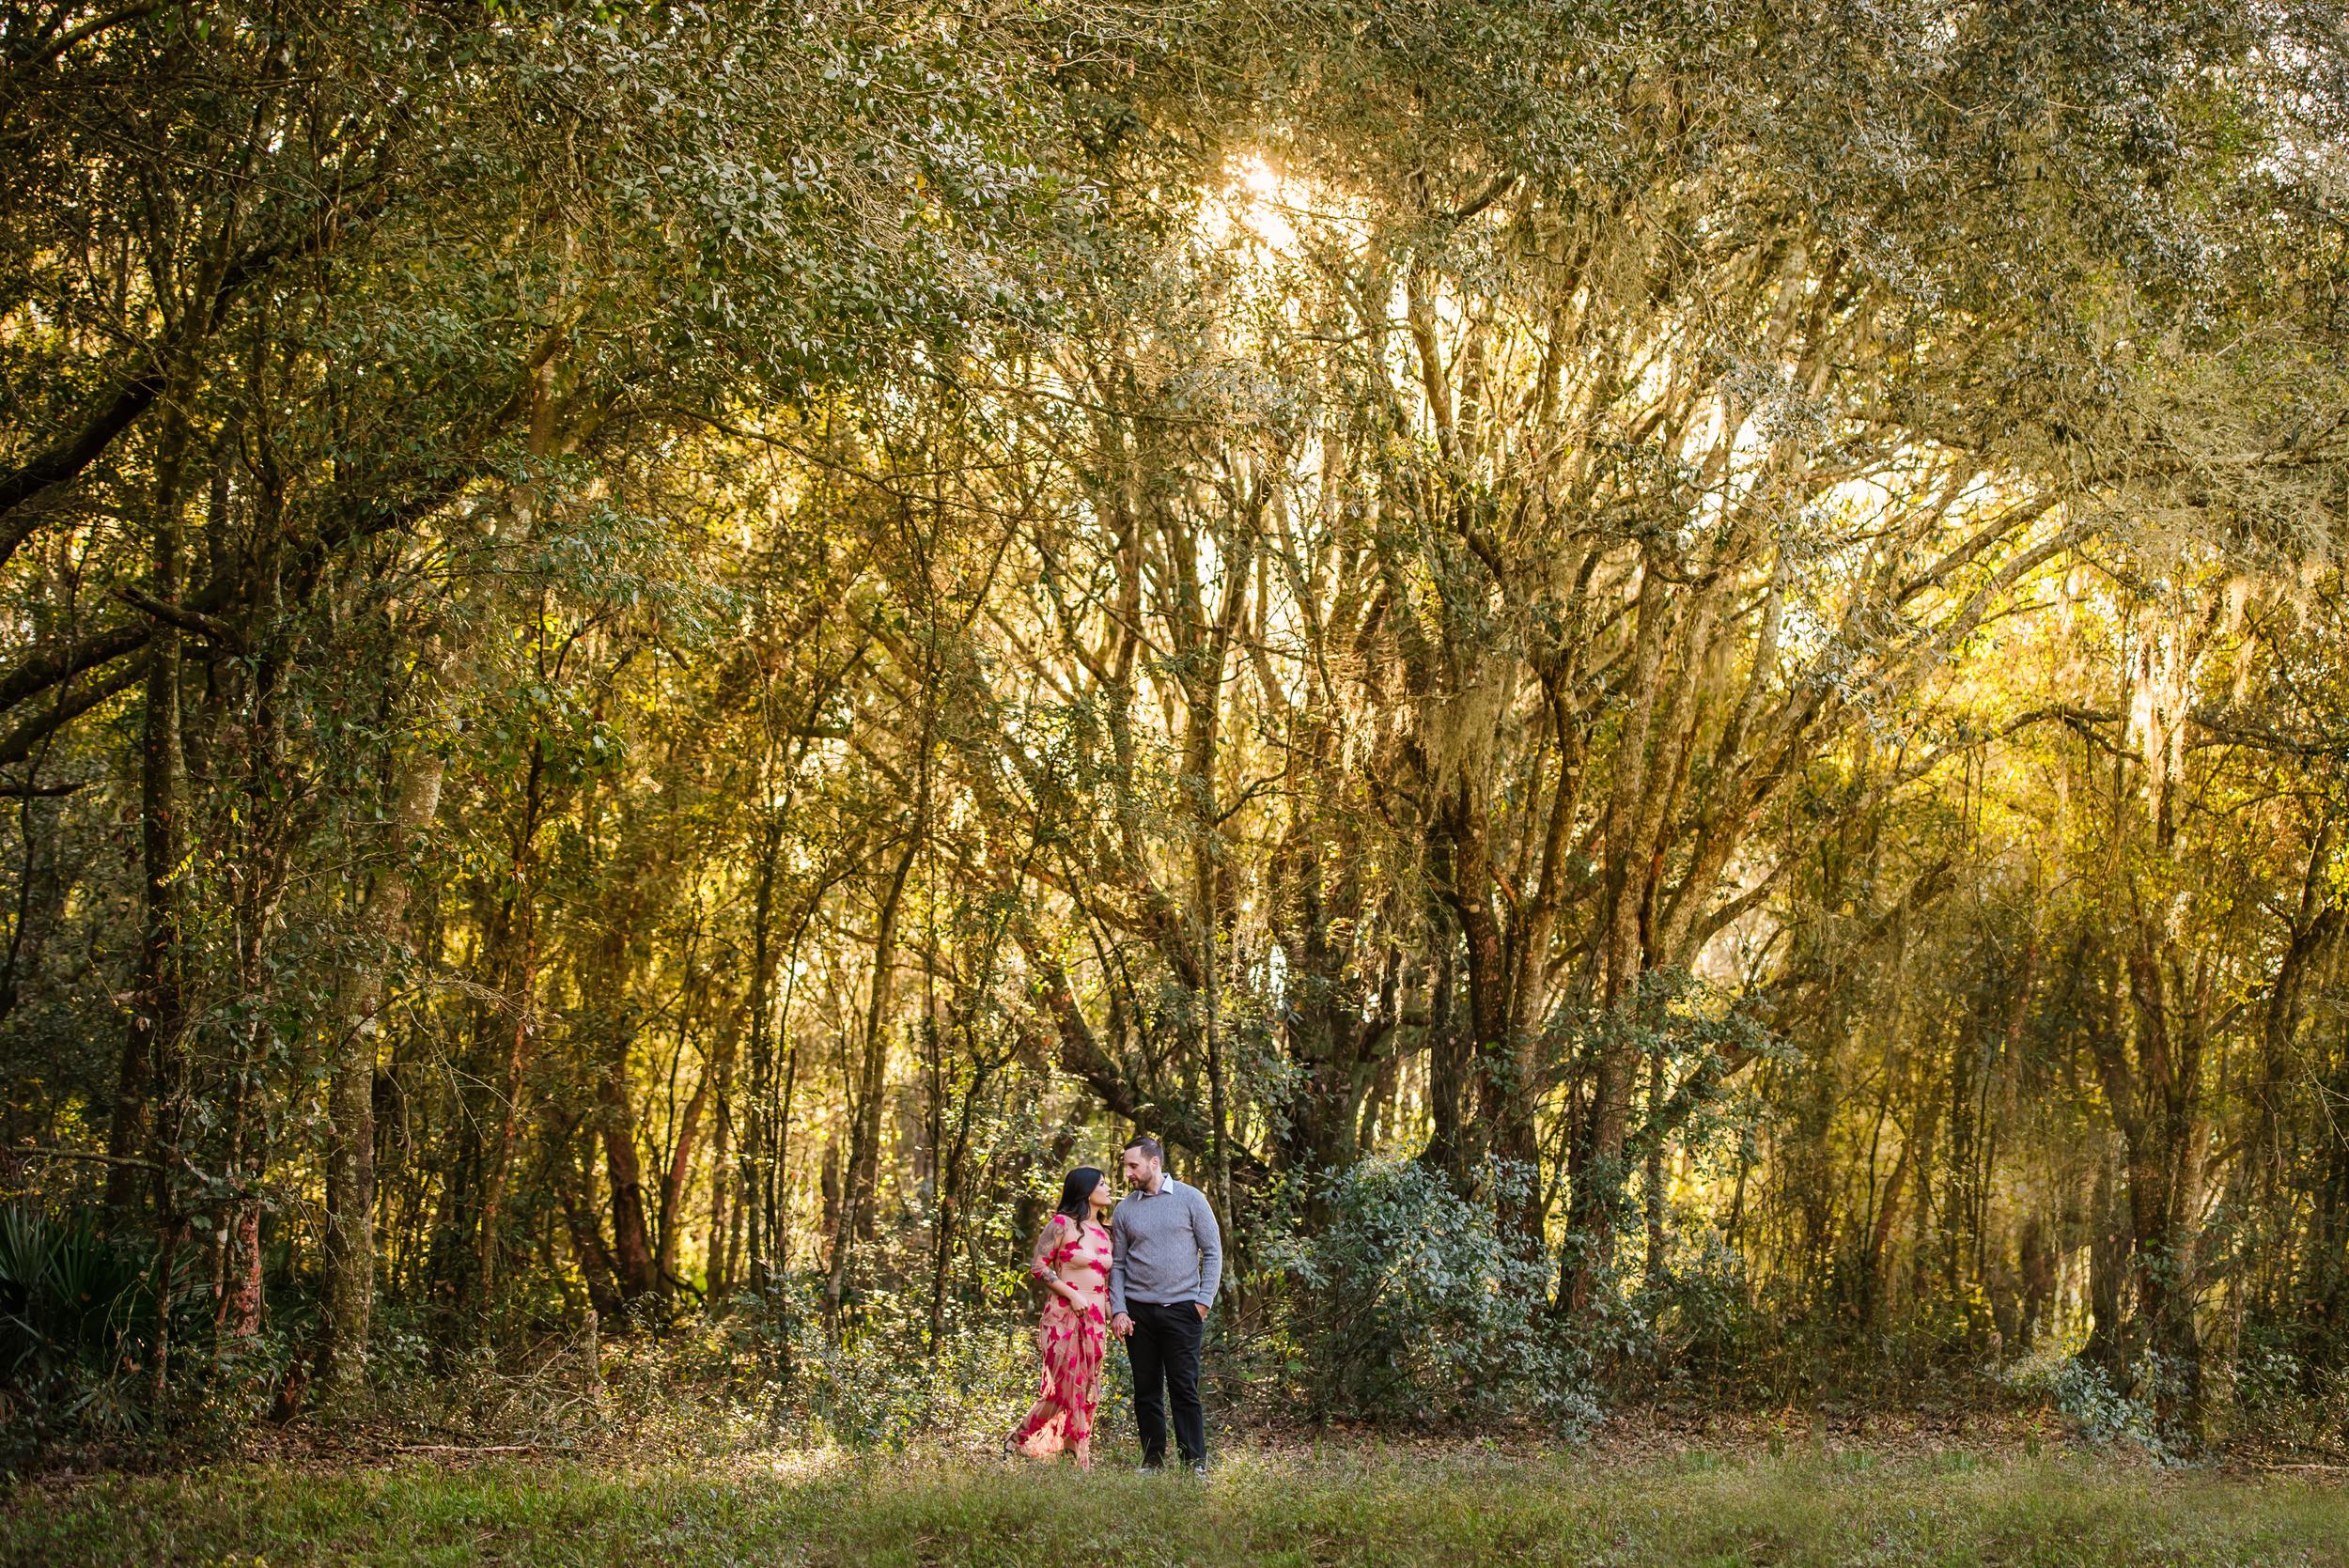 tampa-engagement-photographer-morris-bridge-sun-trees-outdoor-stylish